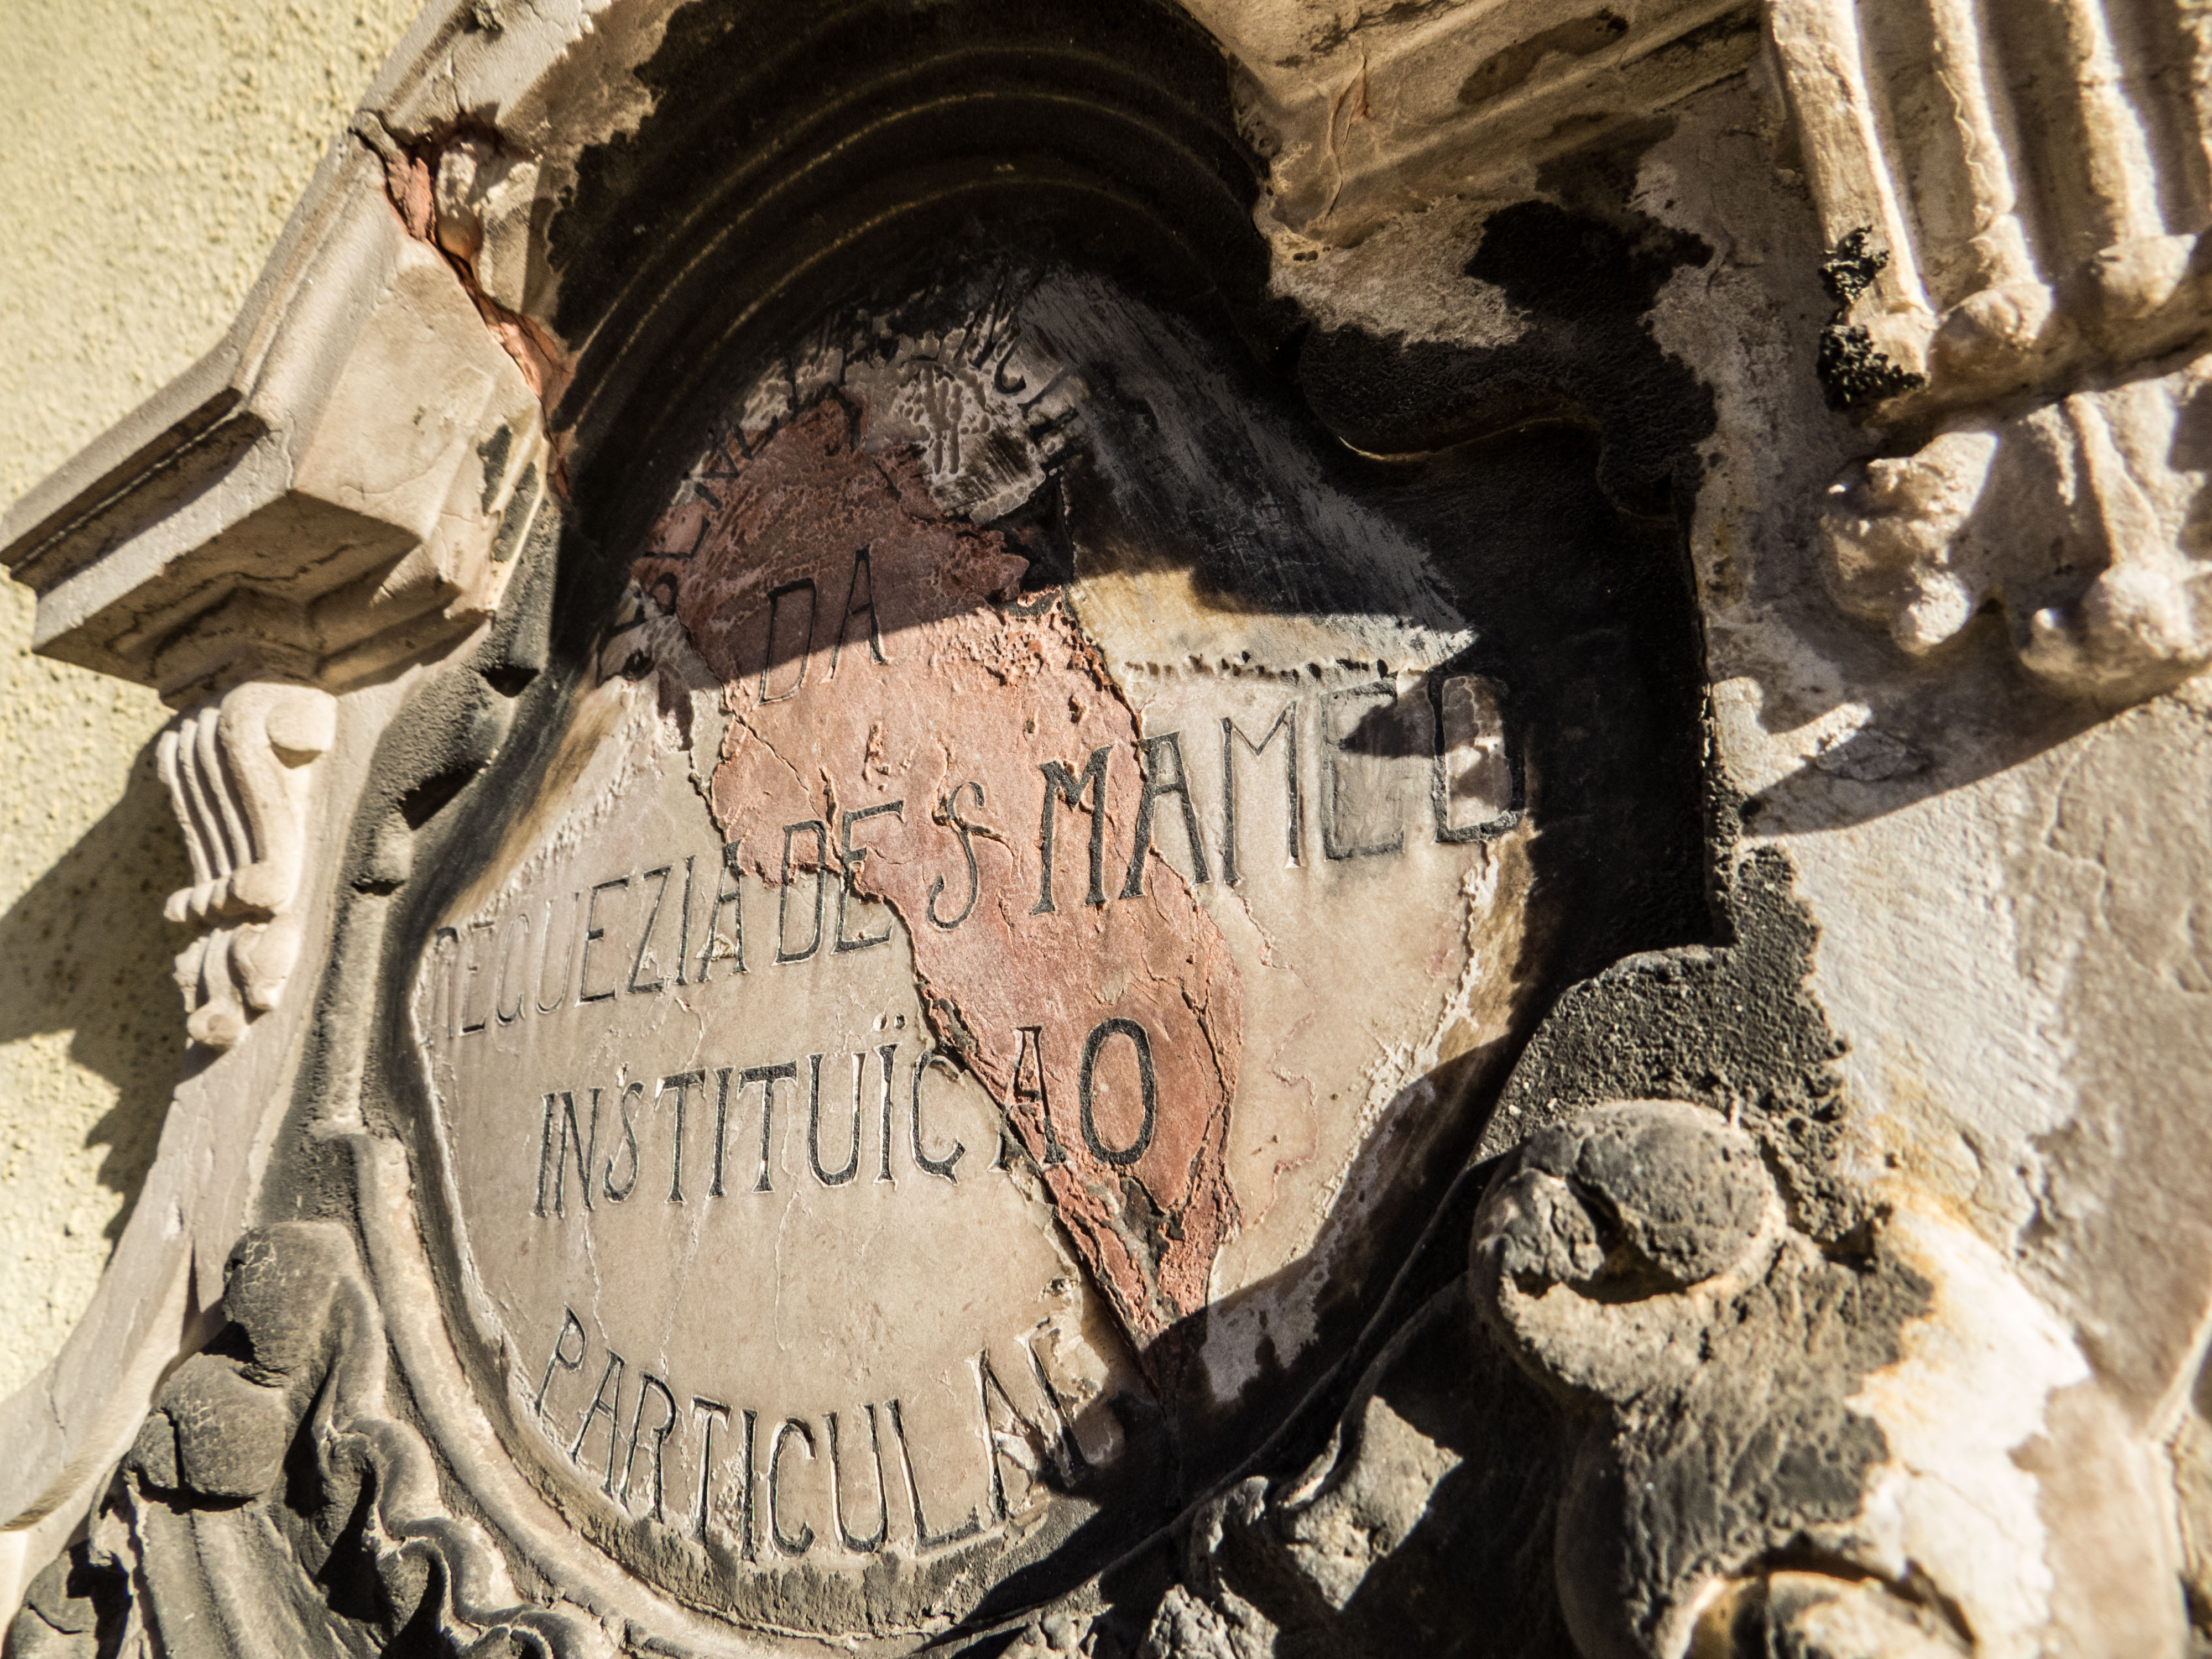 Post ornament, Sign, Stone, Written, Portugal, HQ Photo